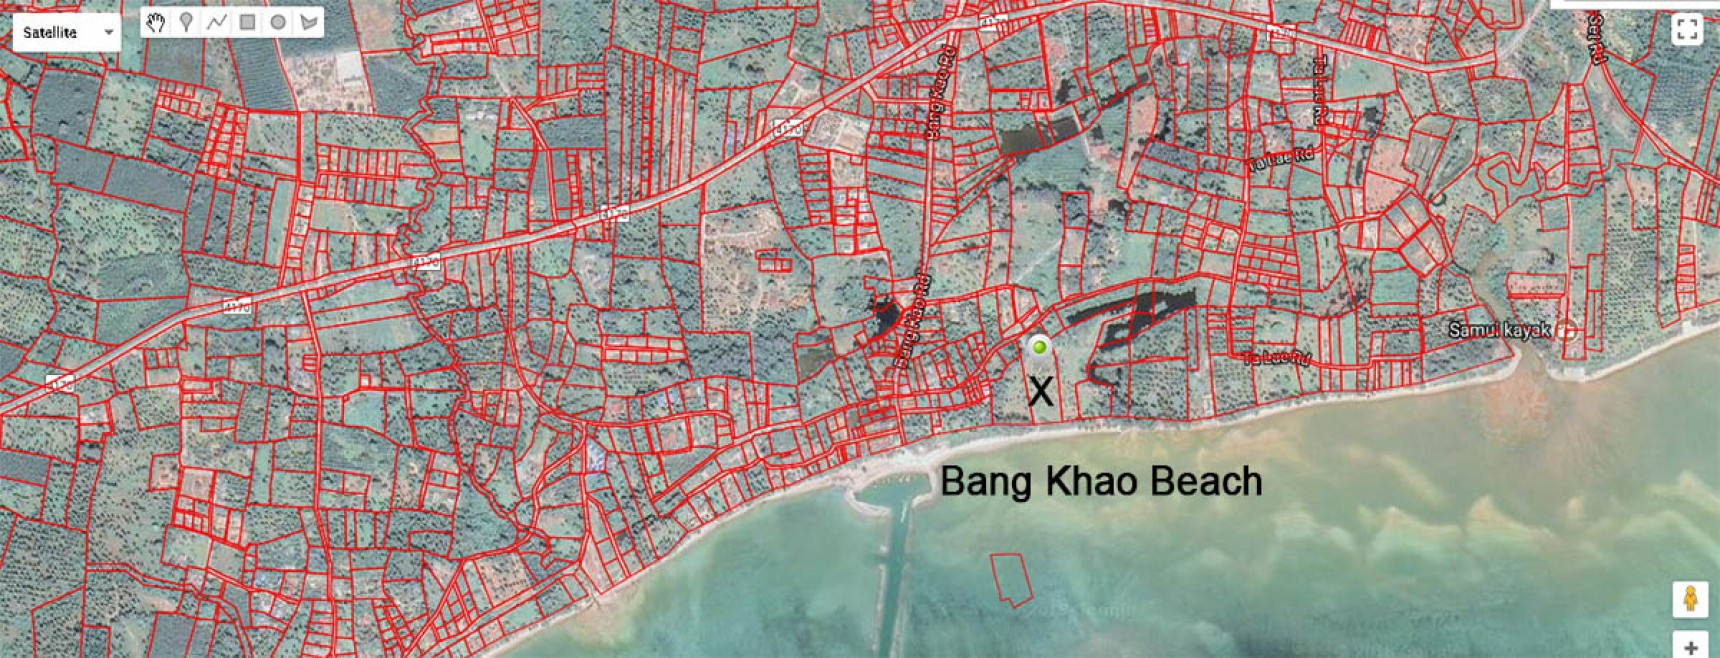 6.3 Rai Beach Land For Sale Koh Samui, Bang Khao Beach (Thai-Real.com)